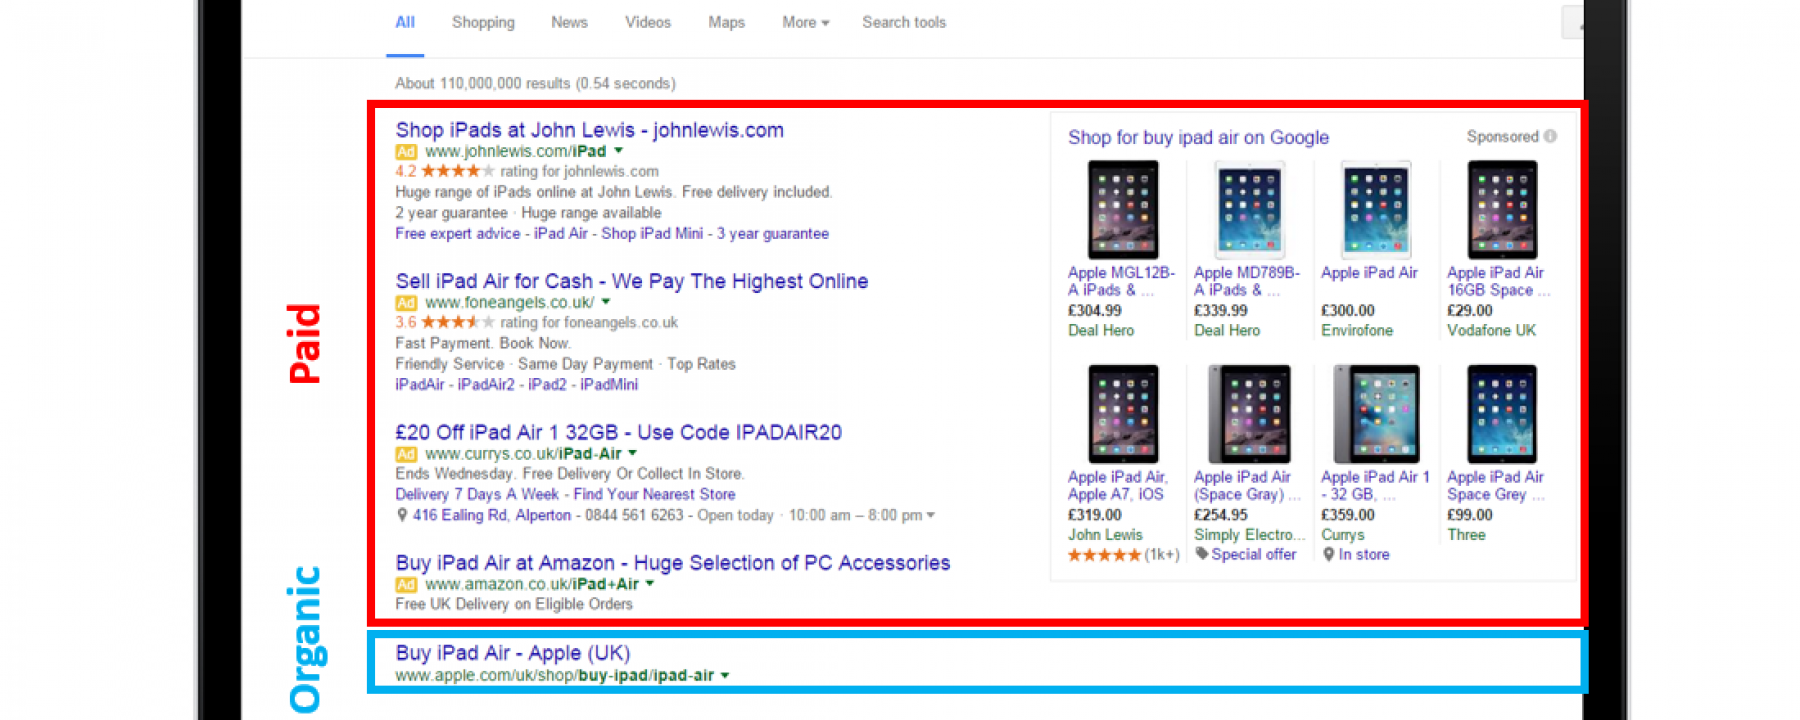 PPC hubbub - Google SERP - Product Listing Ads